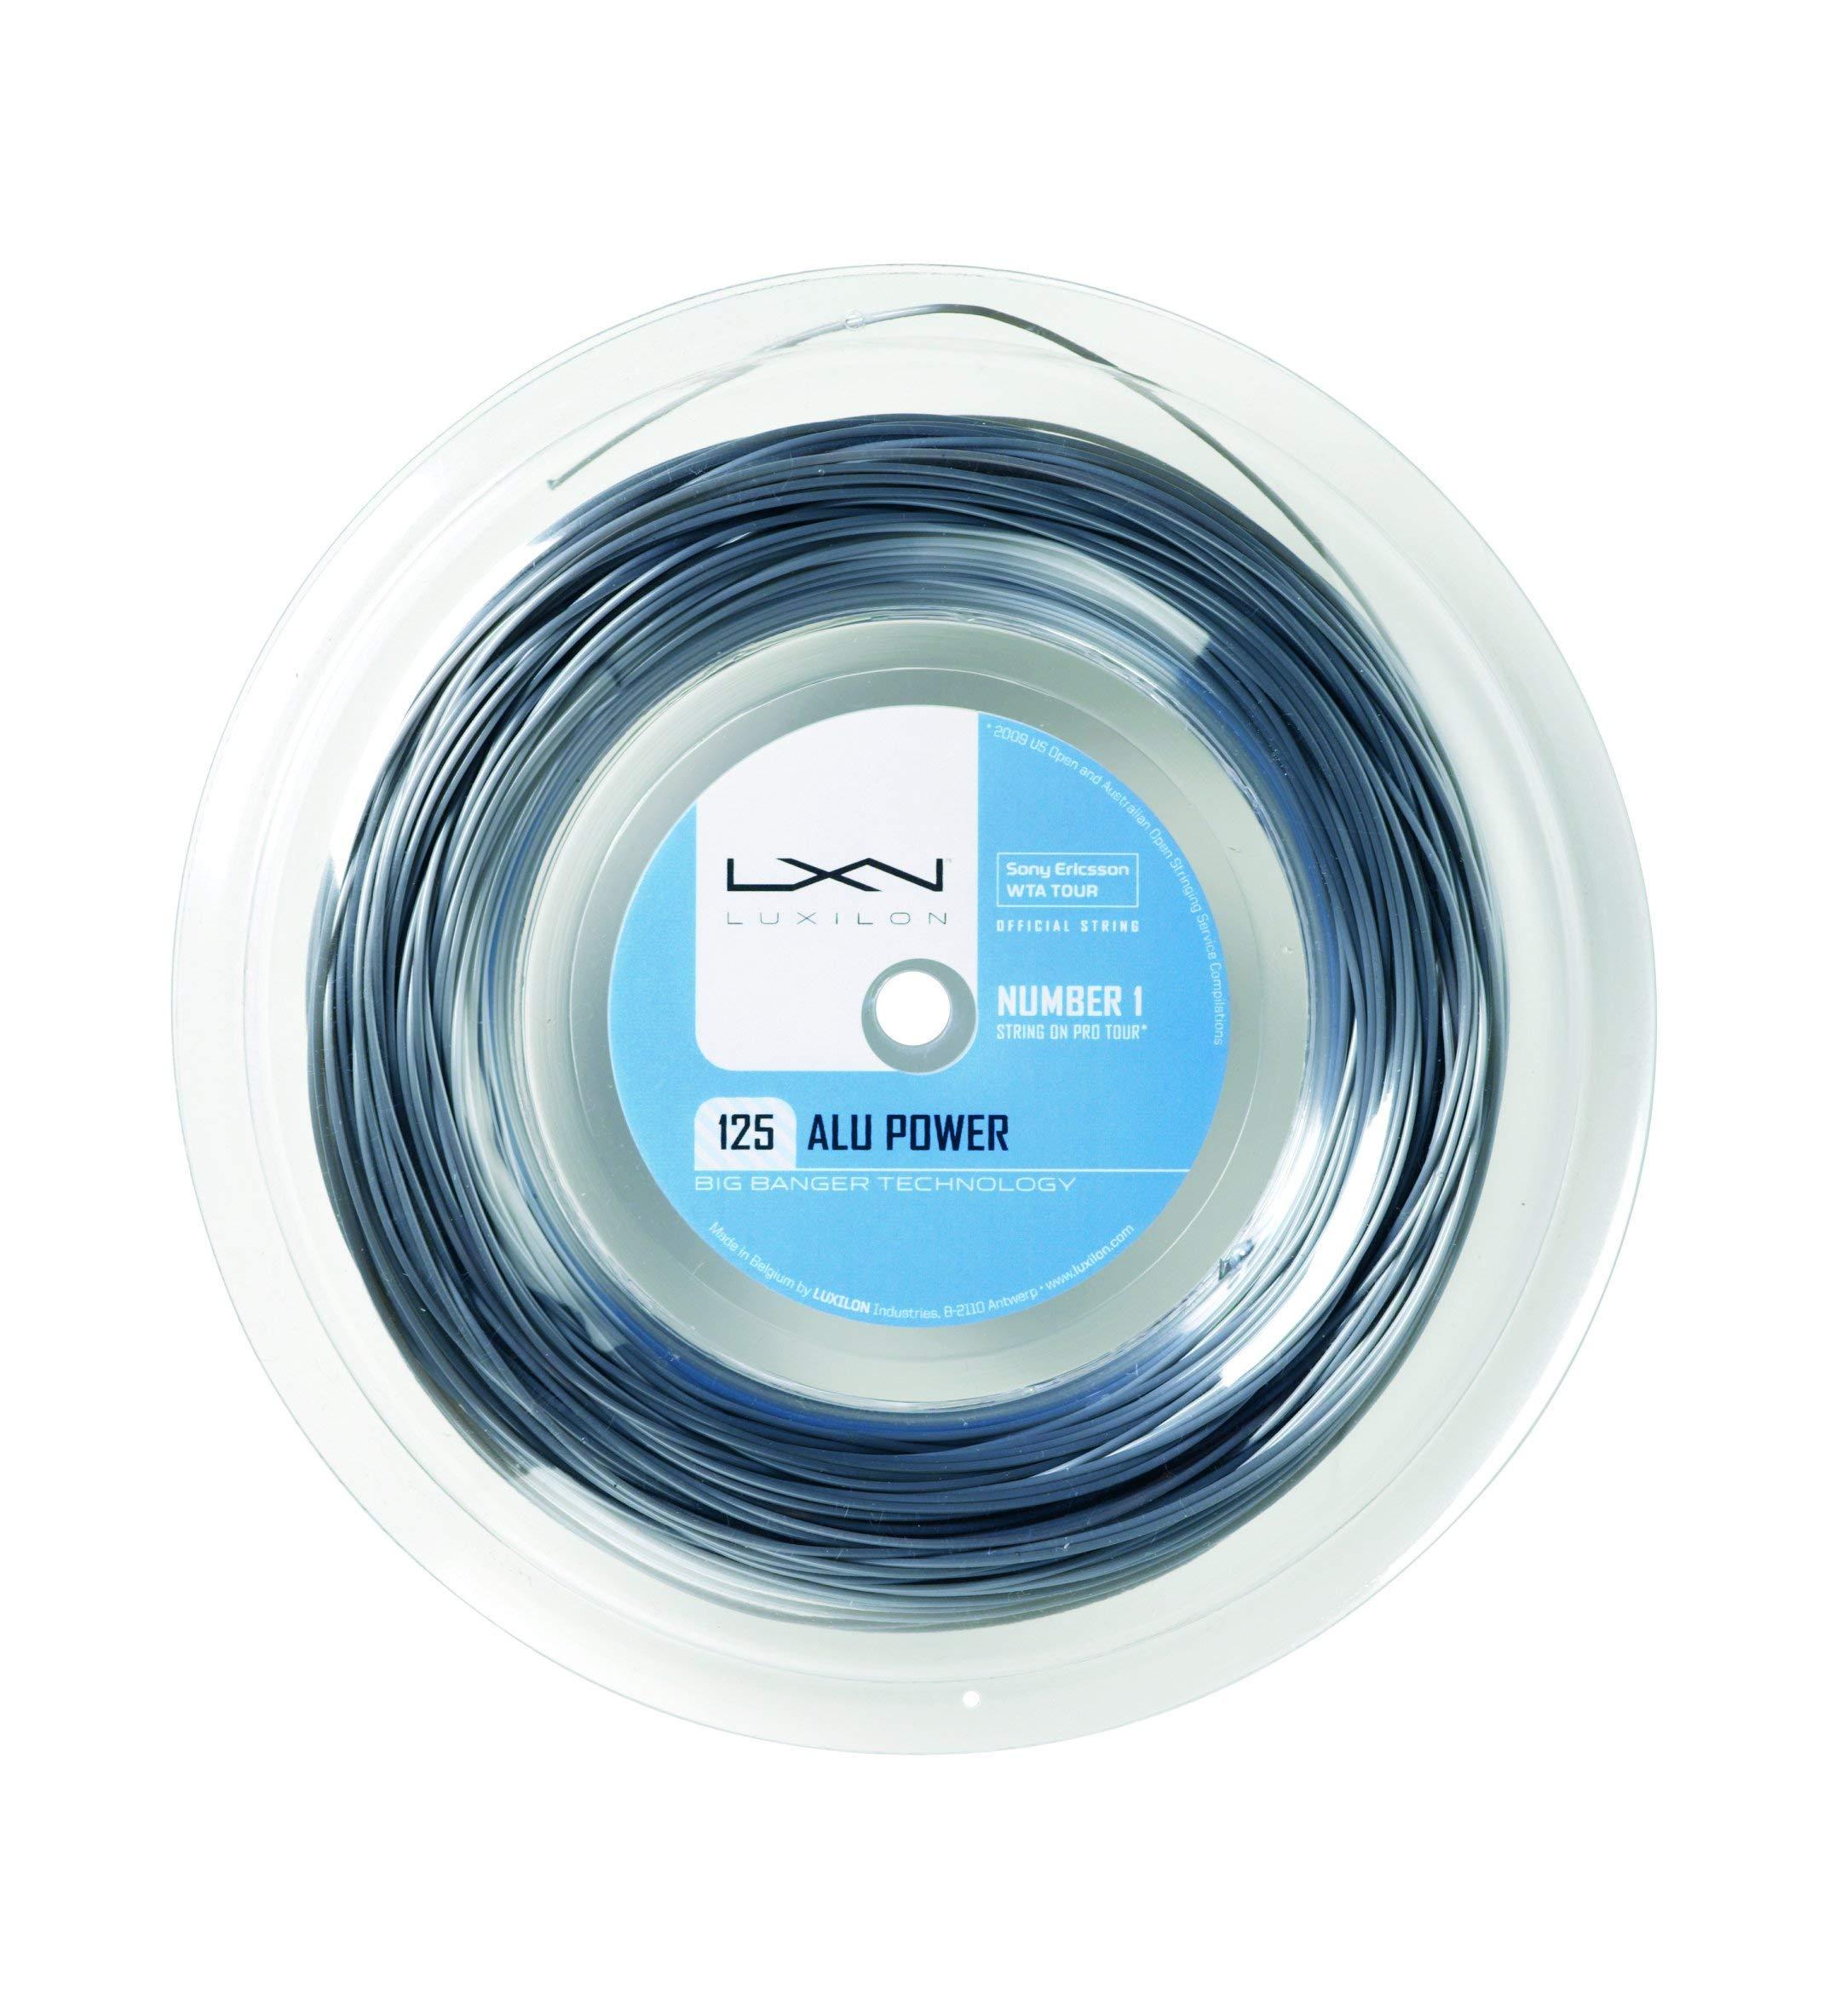 Luxilon ALU Power 125 16L Silver tennis string (330 foot, 100M reel)